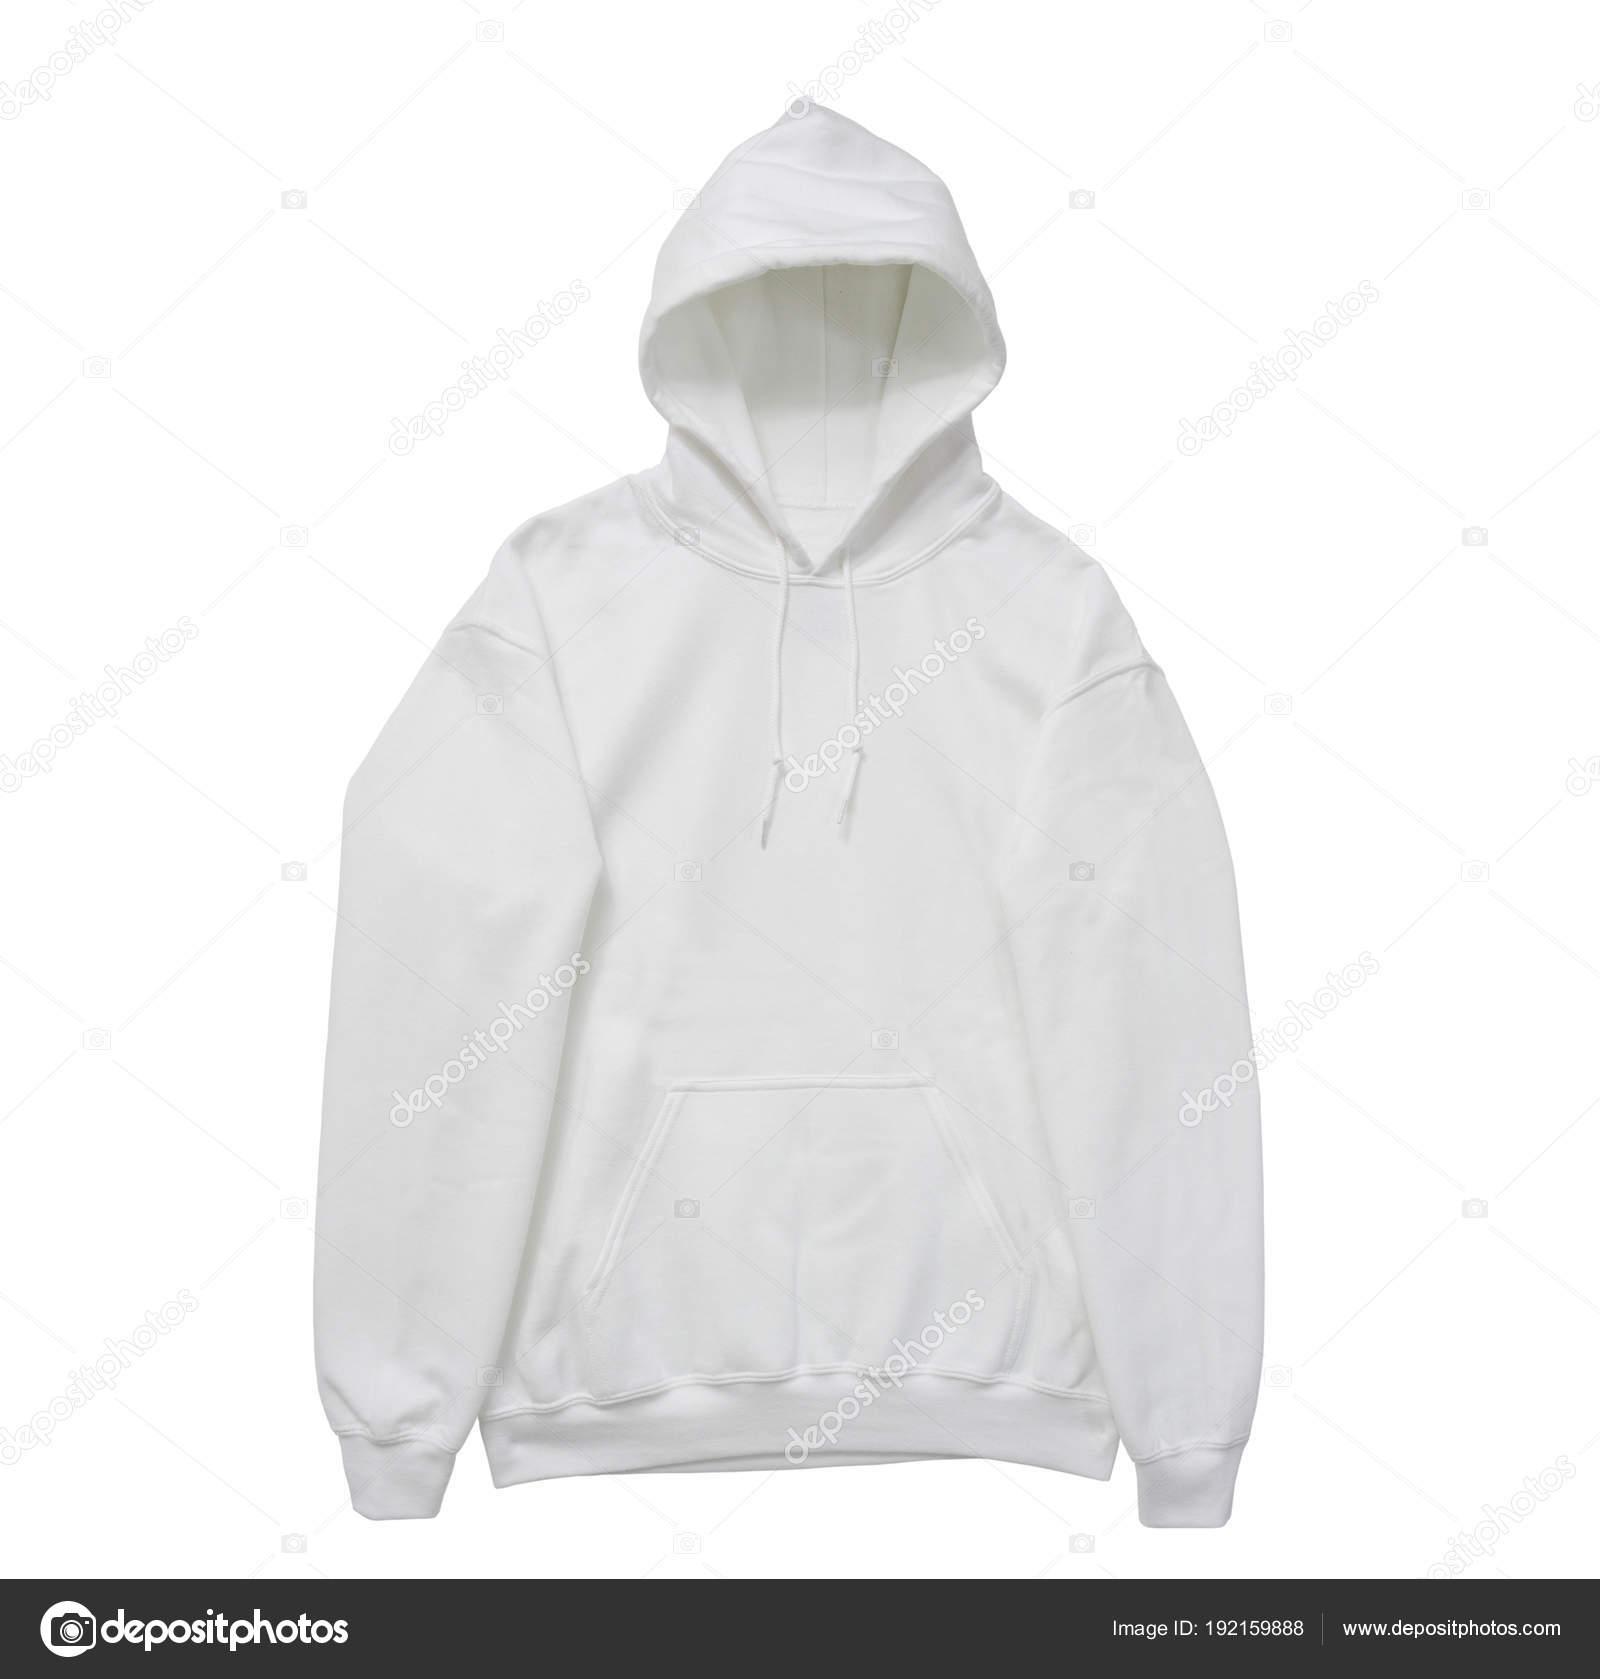 b2f3c049fdea Κενό Hoodie Φούτερ Λευκό Χρώμα Δείτε Μέτωπο Βραχίονα Λευκό Φόντο– εικόνα  αρχείου